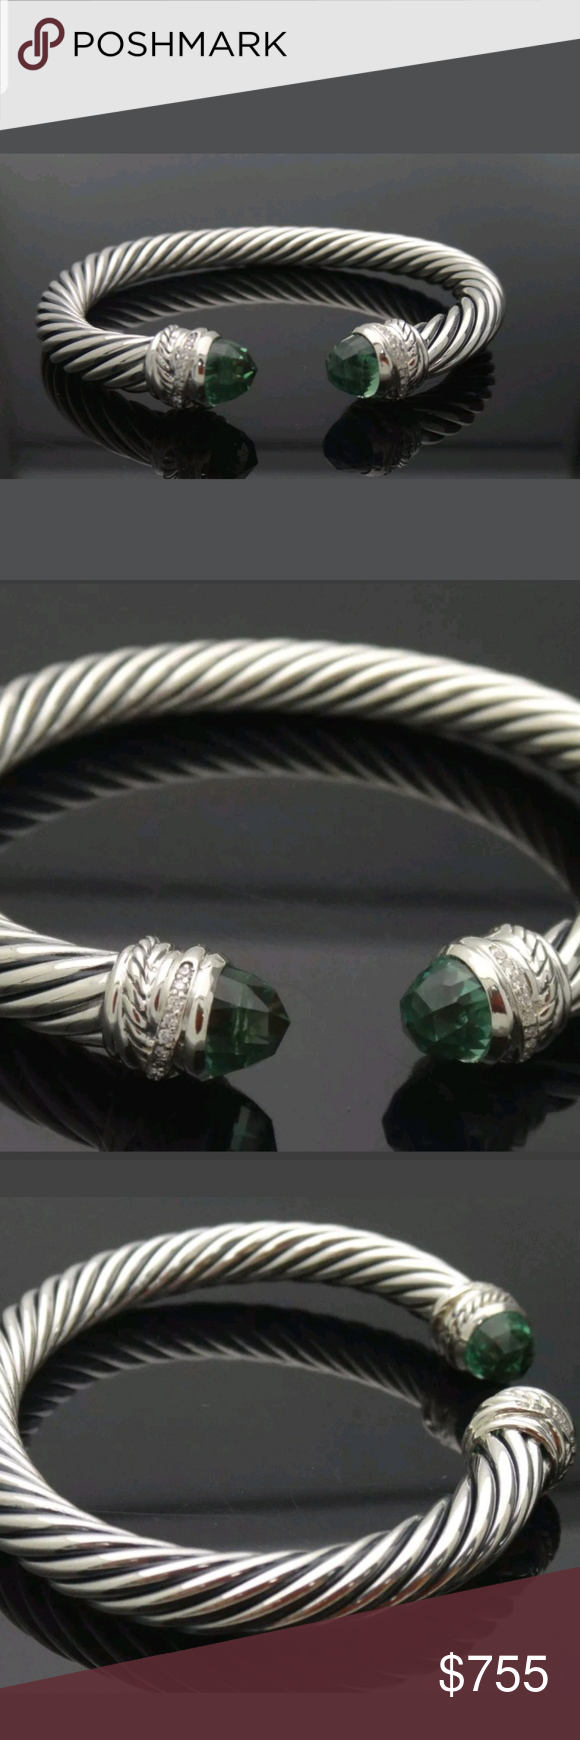 33+ Quality of david yurman jewelry ideas in 2021